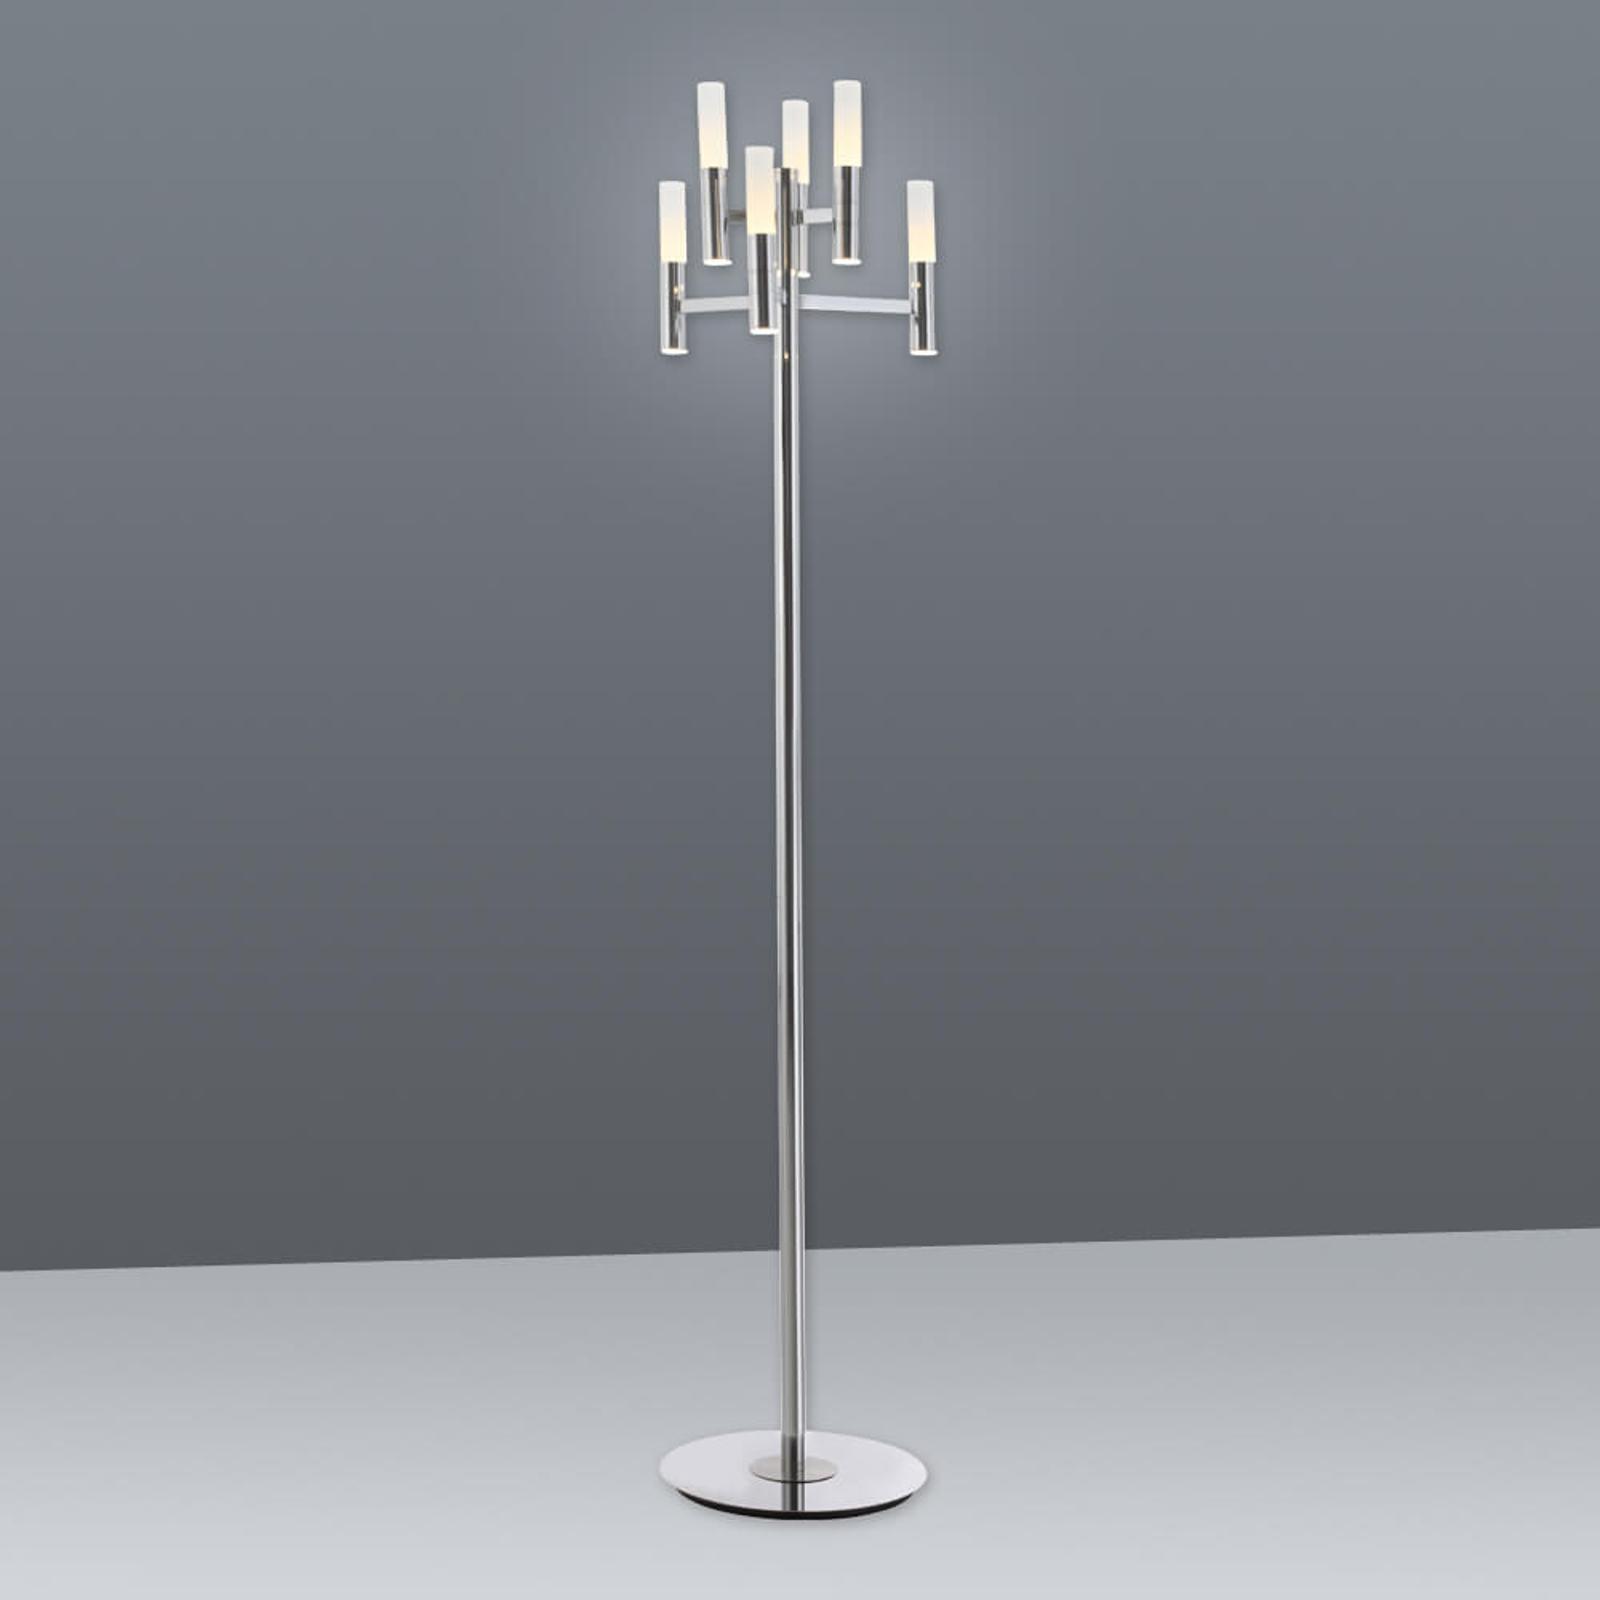 Lampa stojąca LED Irina – 6-punktowa